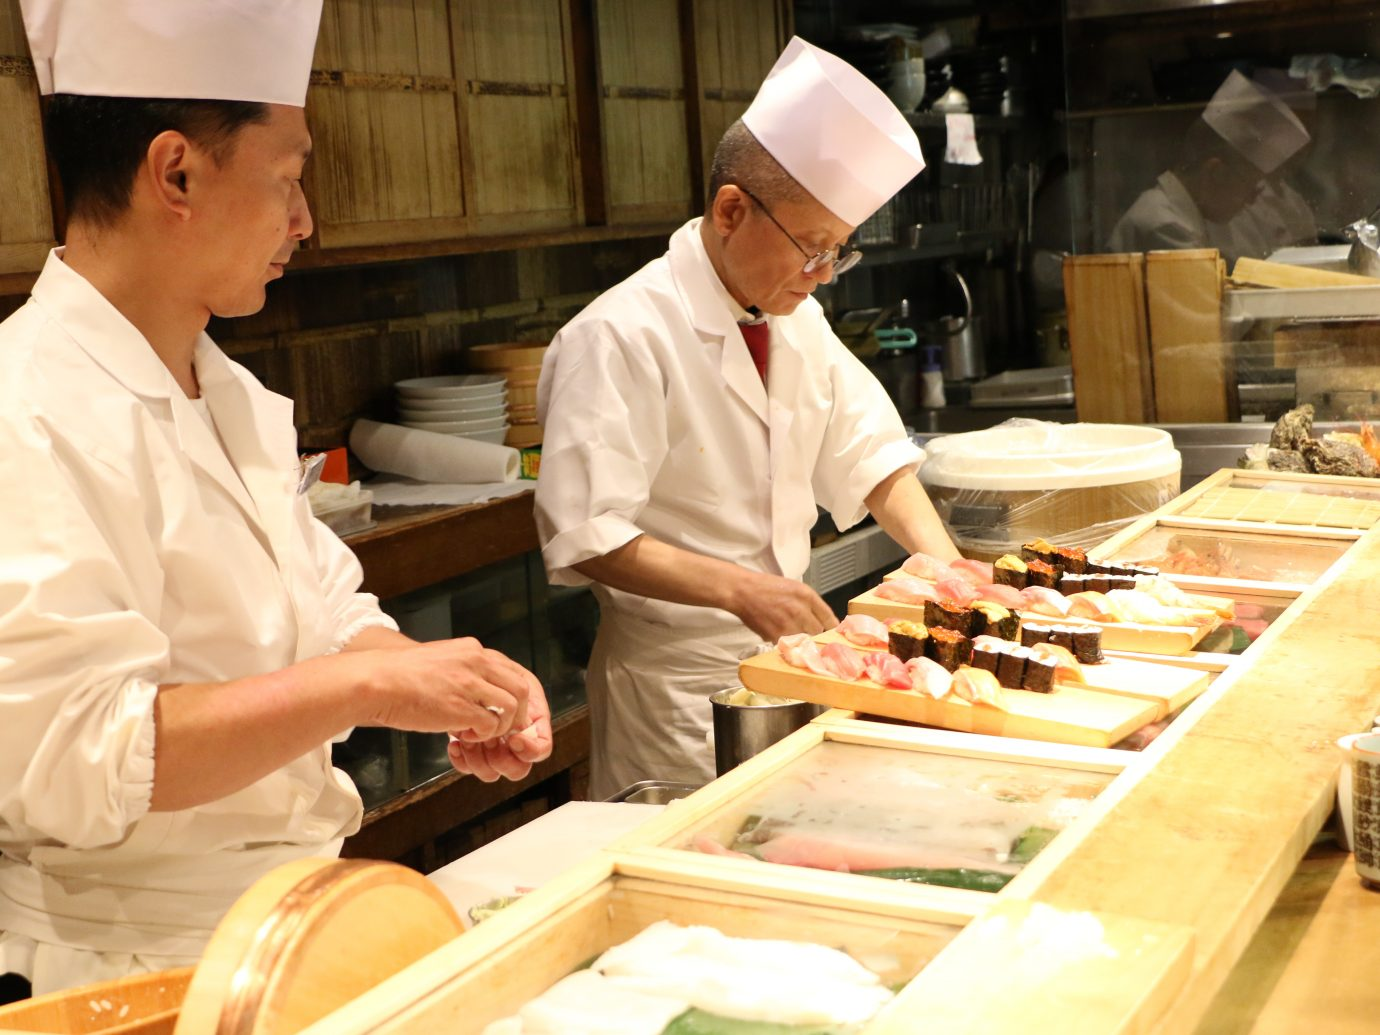 Sushi chefs preparing Sushi plate at small restaurant in Tsukiji Fish Market